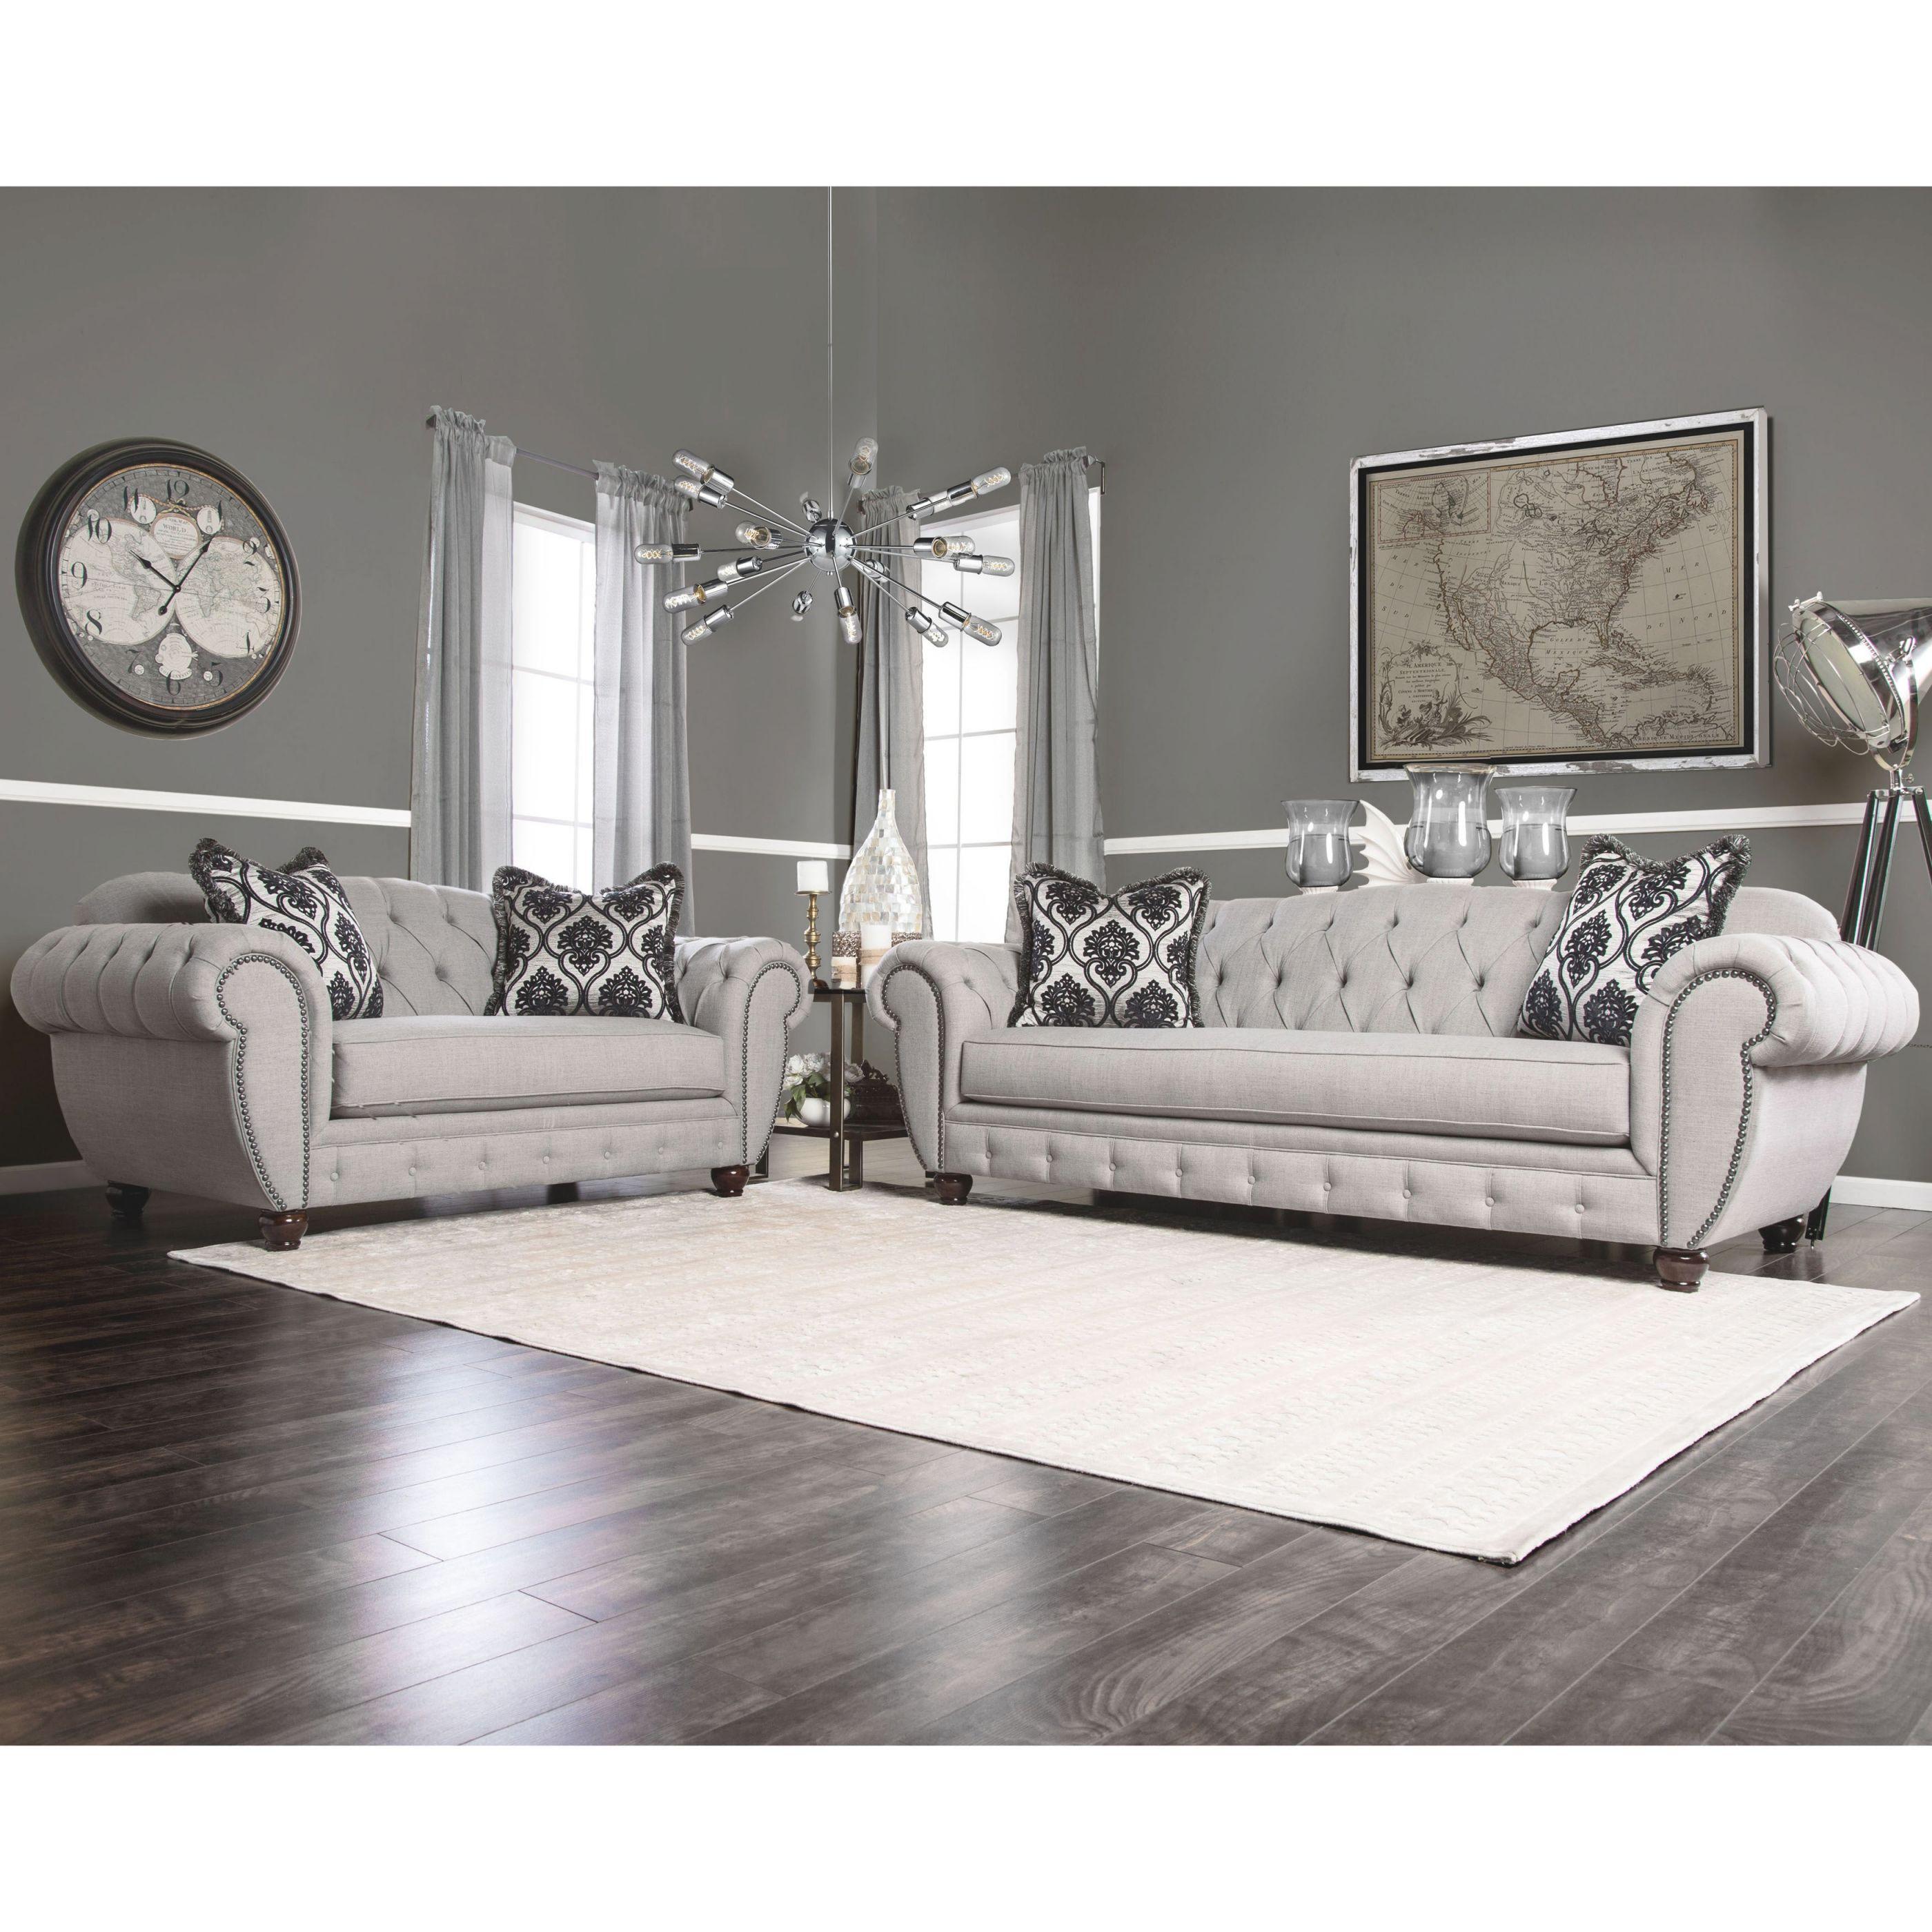 Furniture Of America Augusta Victorian Grey 2-Piece Sofa Set inside Unique Victorian Living Room Furniture